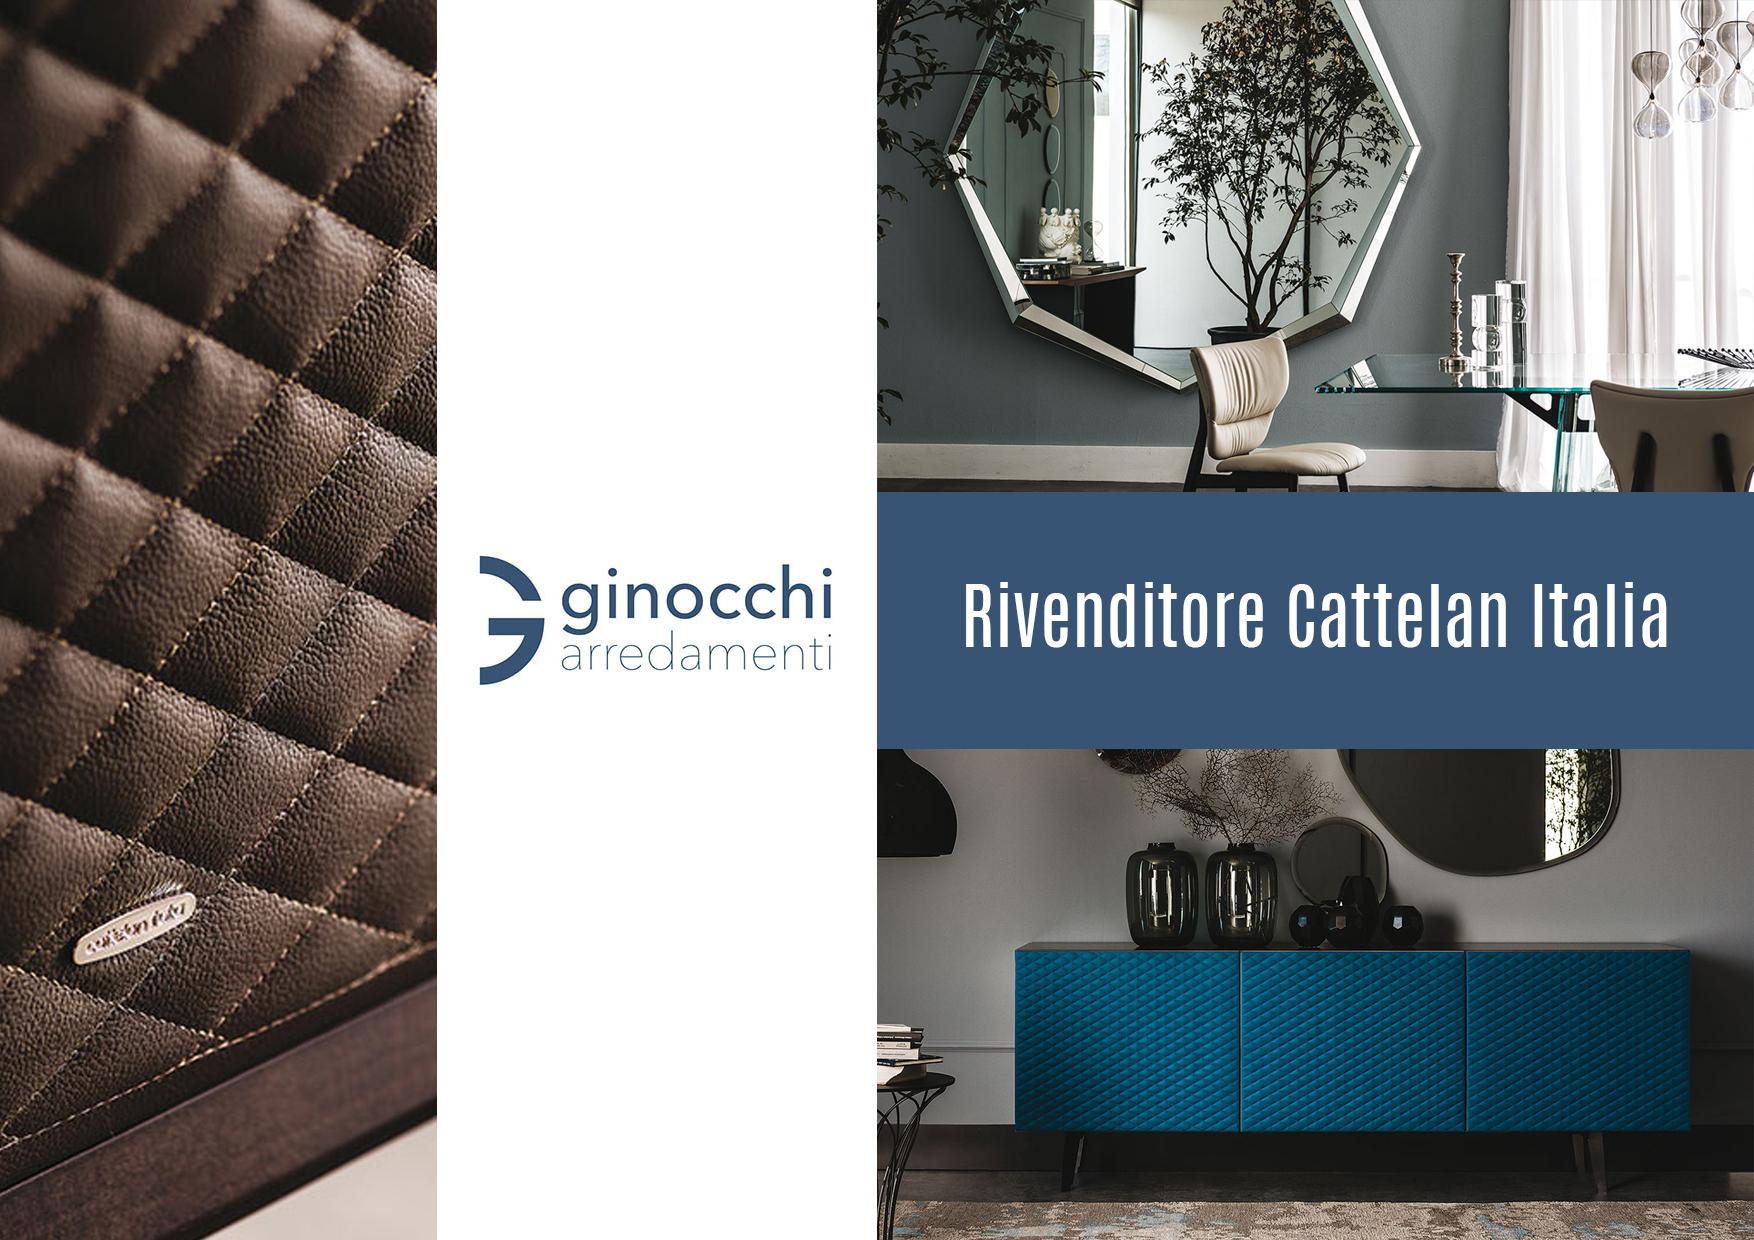 Ginocchi Arredamenti Rivenditore Cattelan Italia a Roma